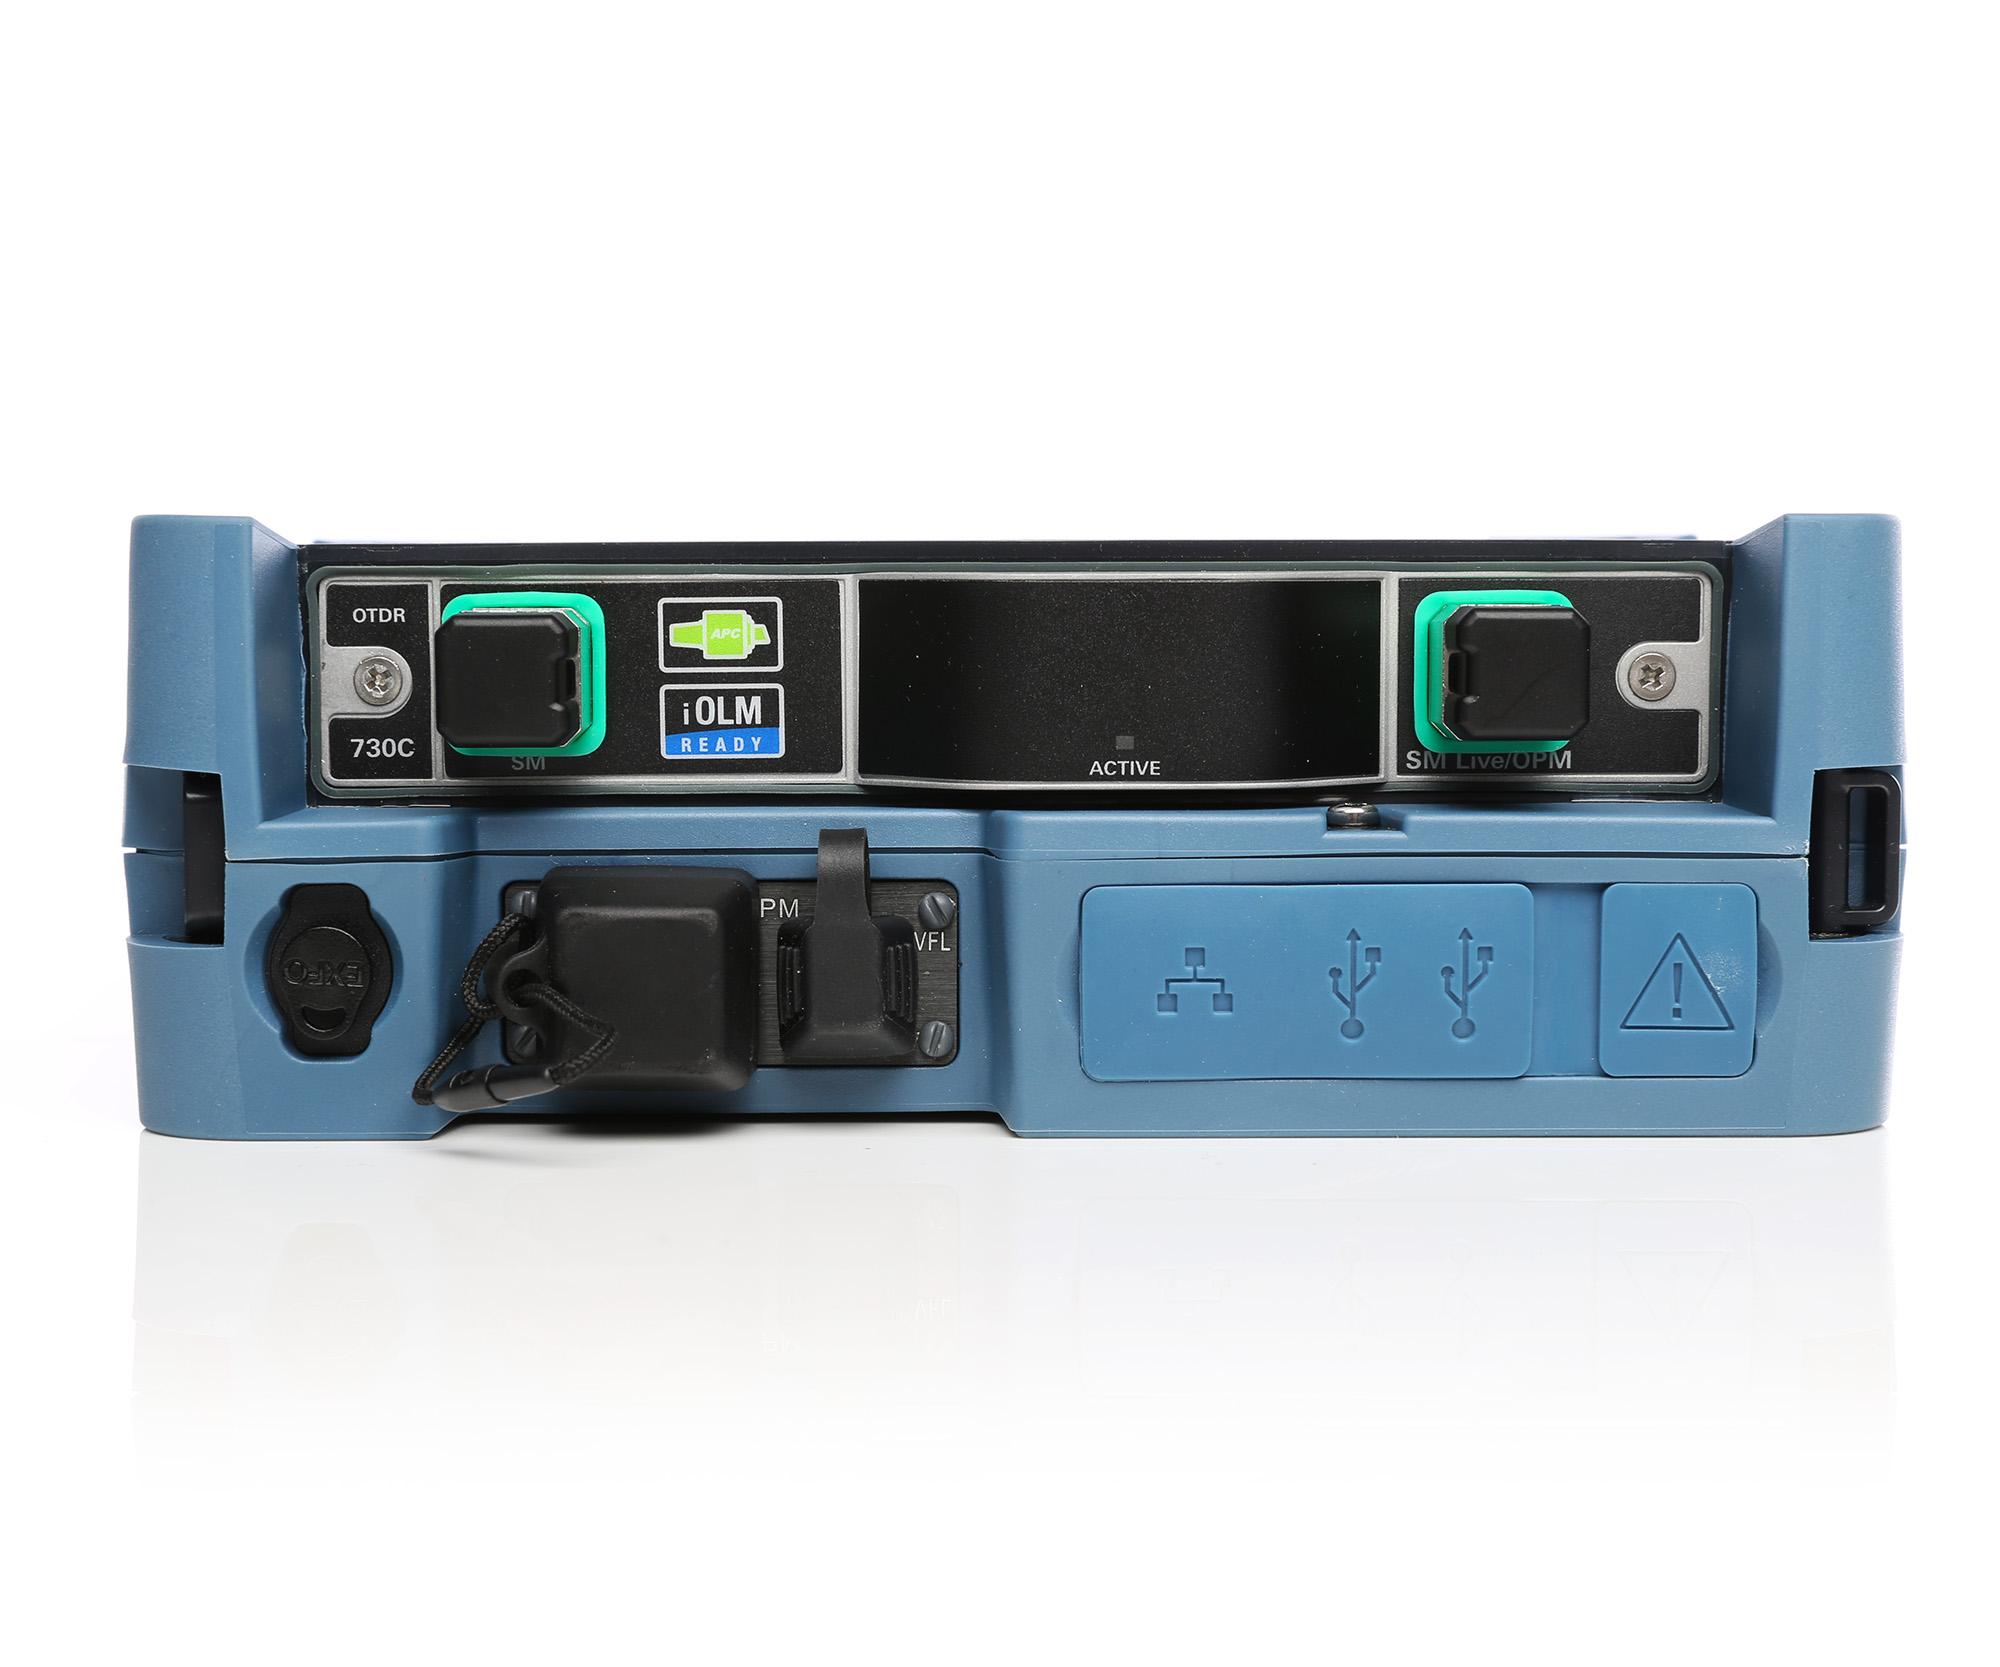 MaxTester 730C   Metro Networks   OTDR